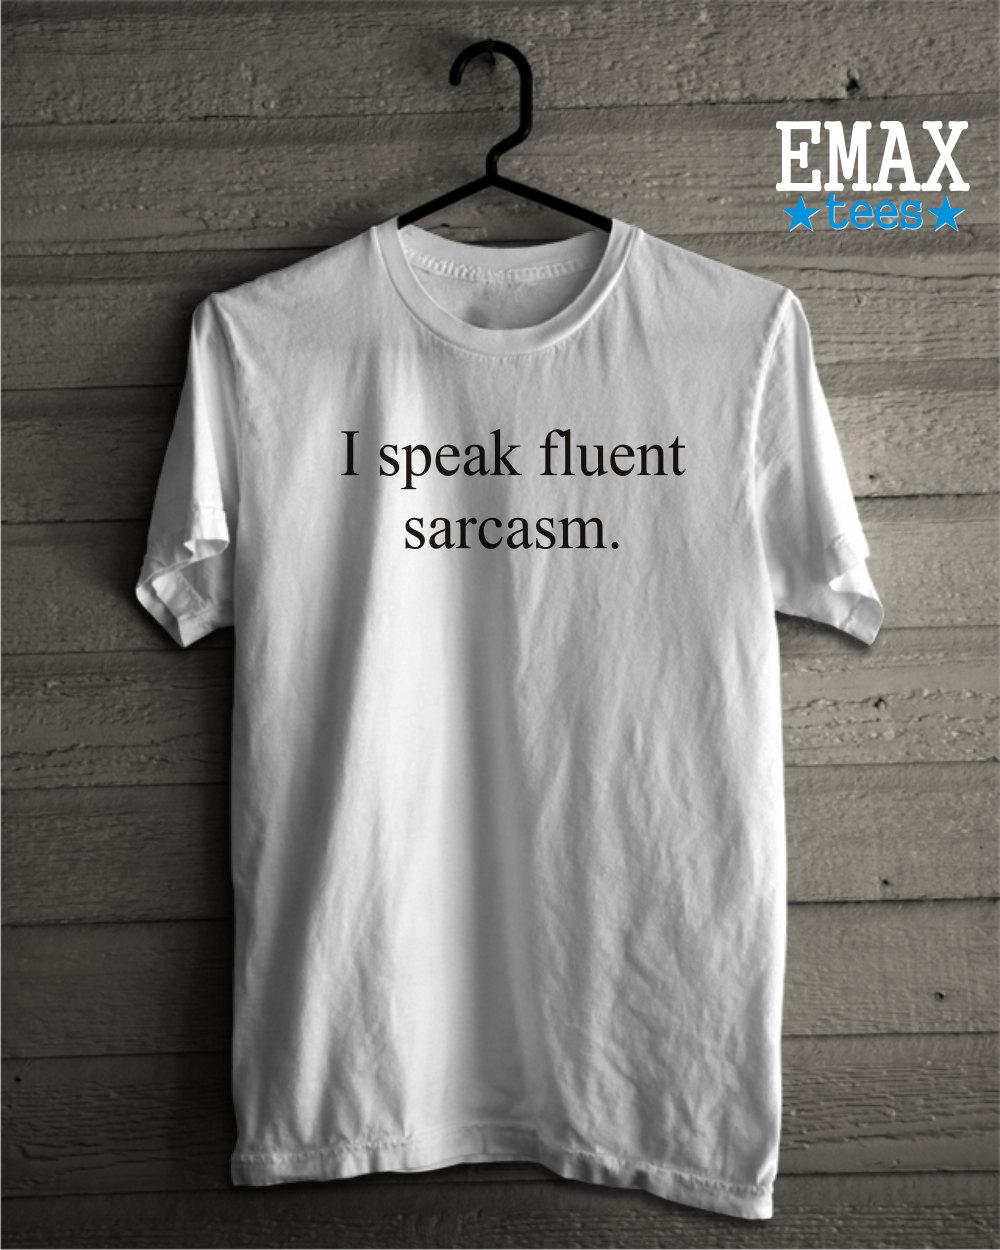 a2bdc487 I Speak Fluent Sarcasm T-shirt, Sarcastic Shirt with Funny Sarcasm ...